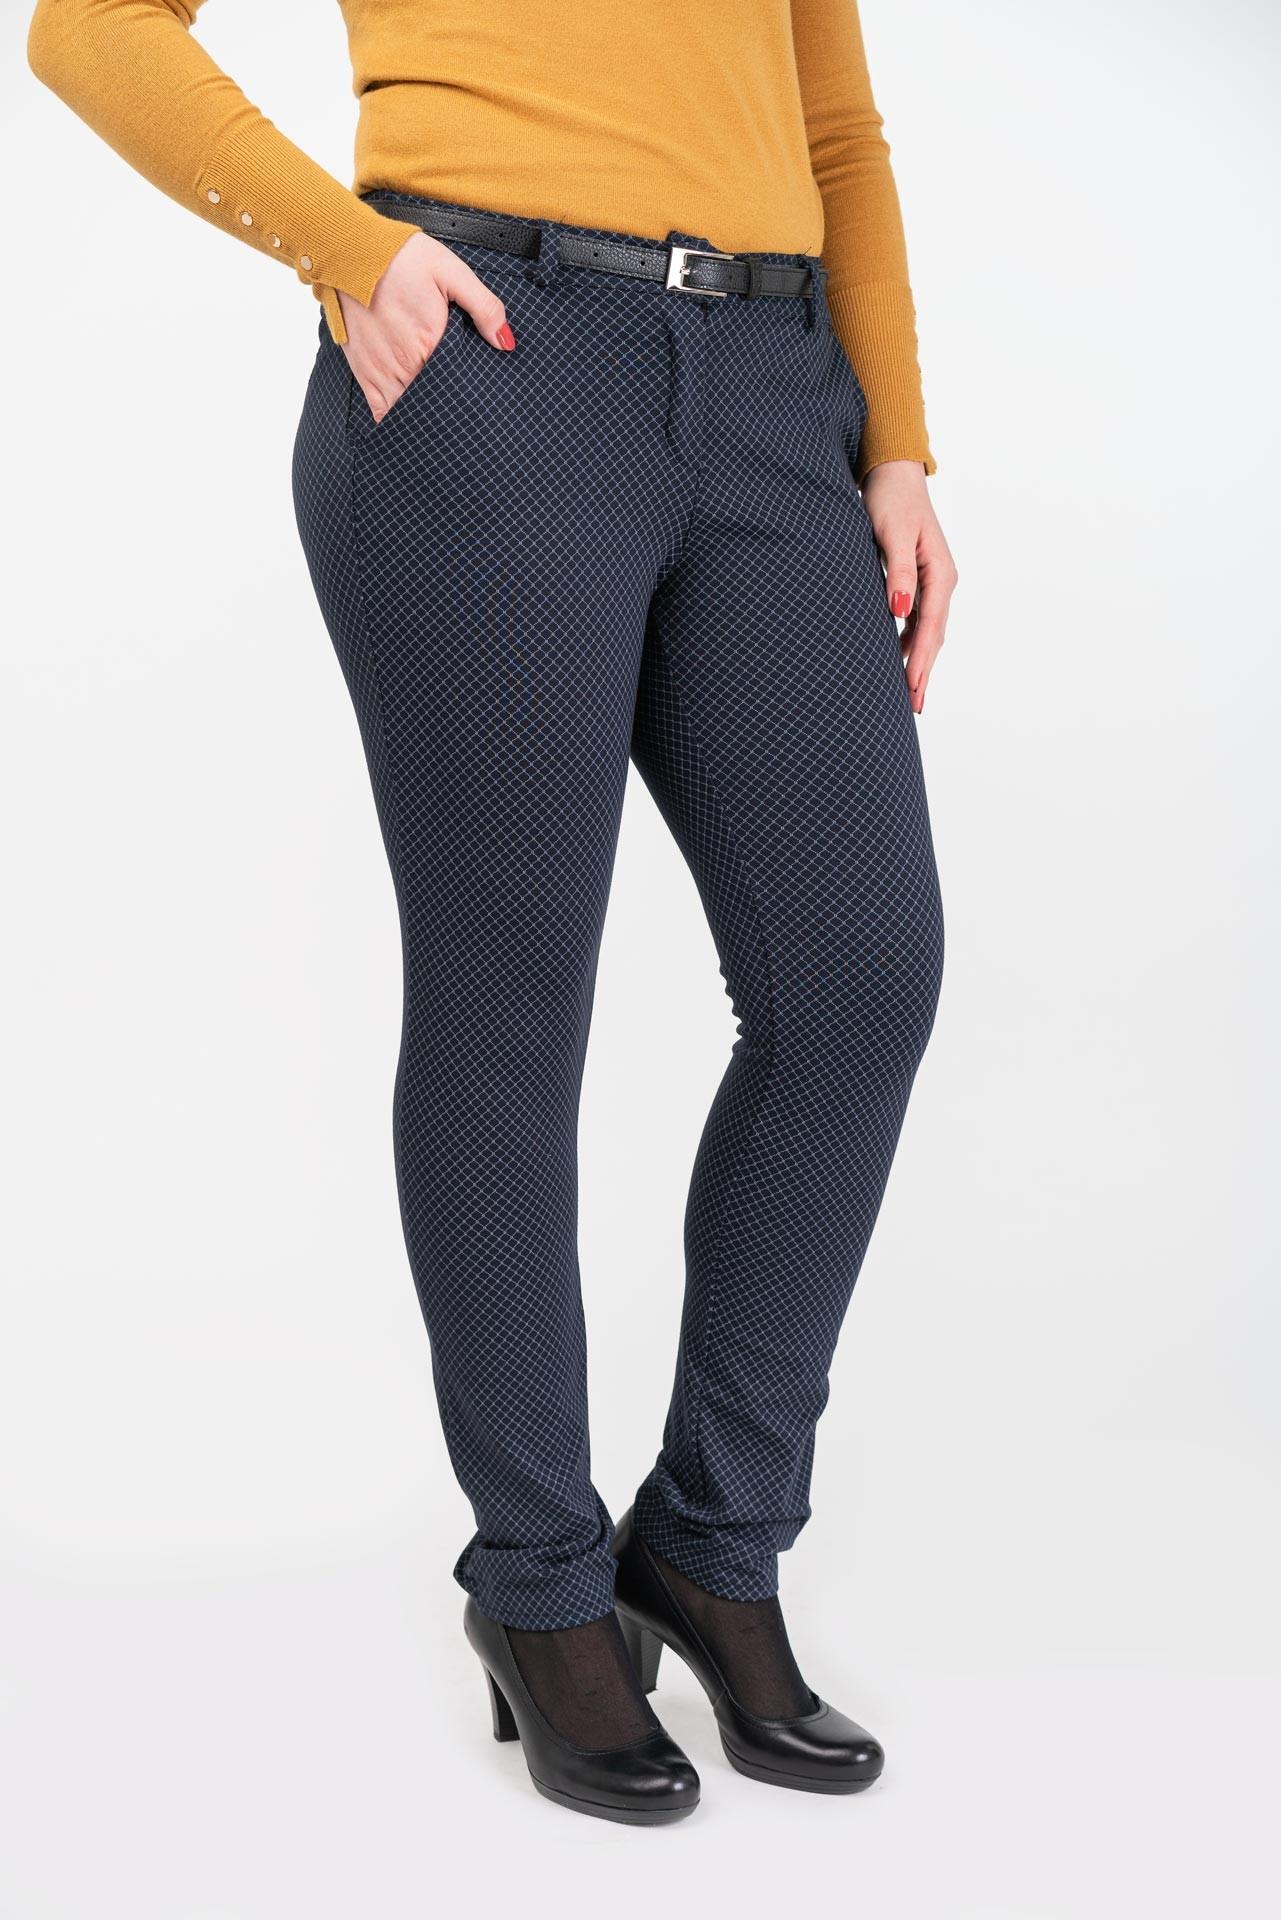 Dámské kalhoty AREVA